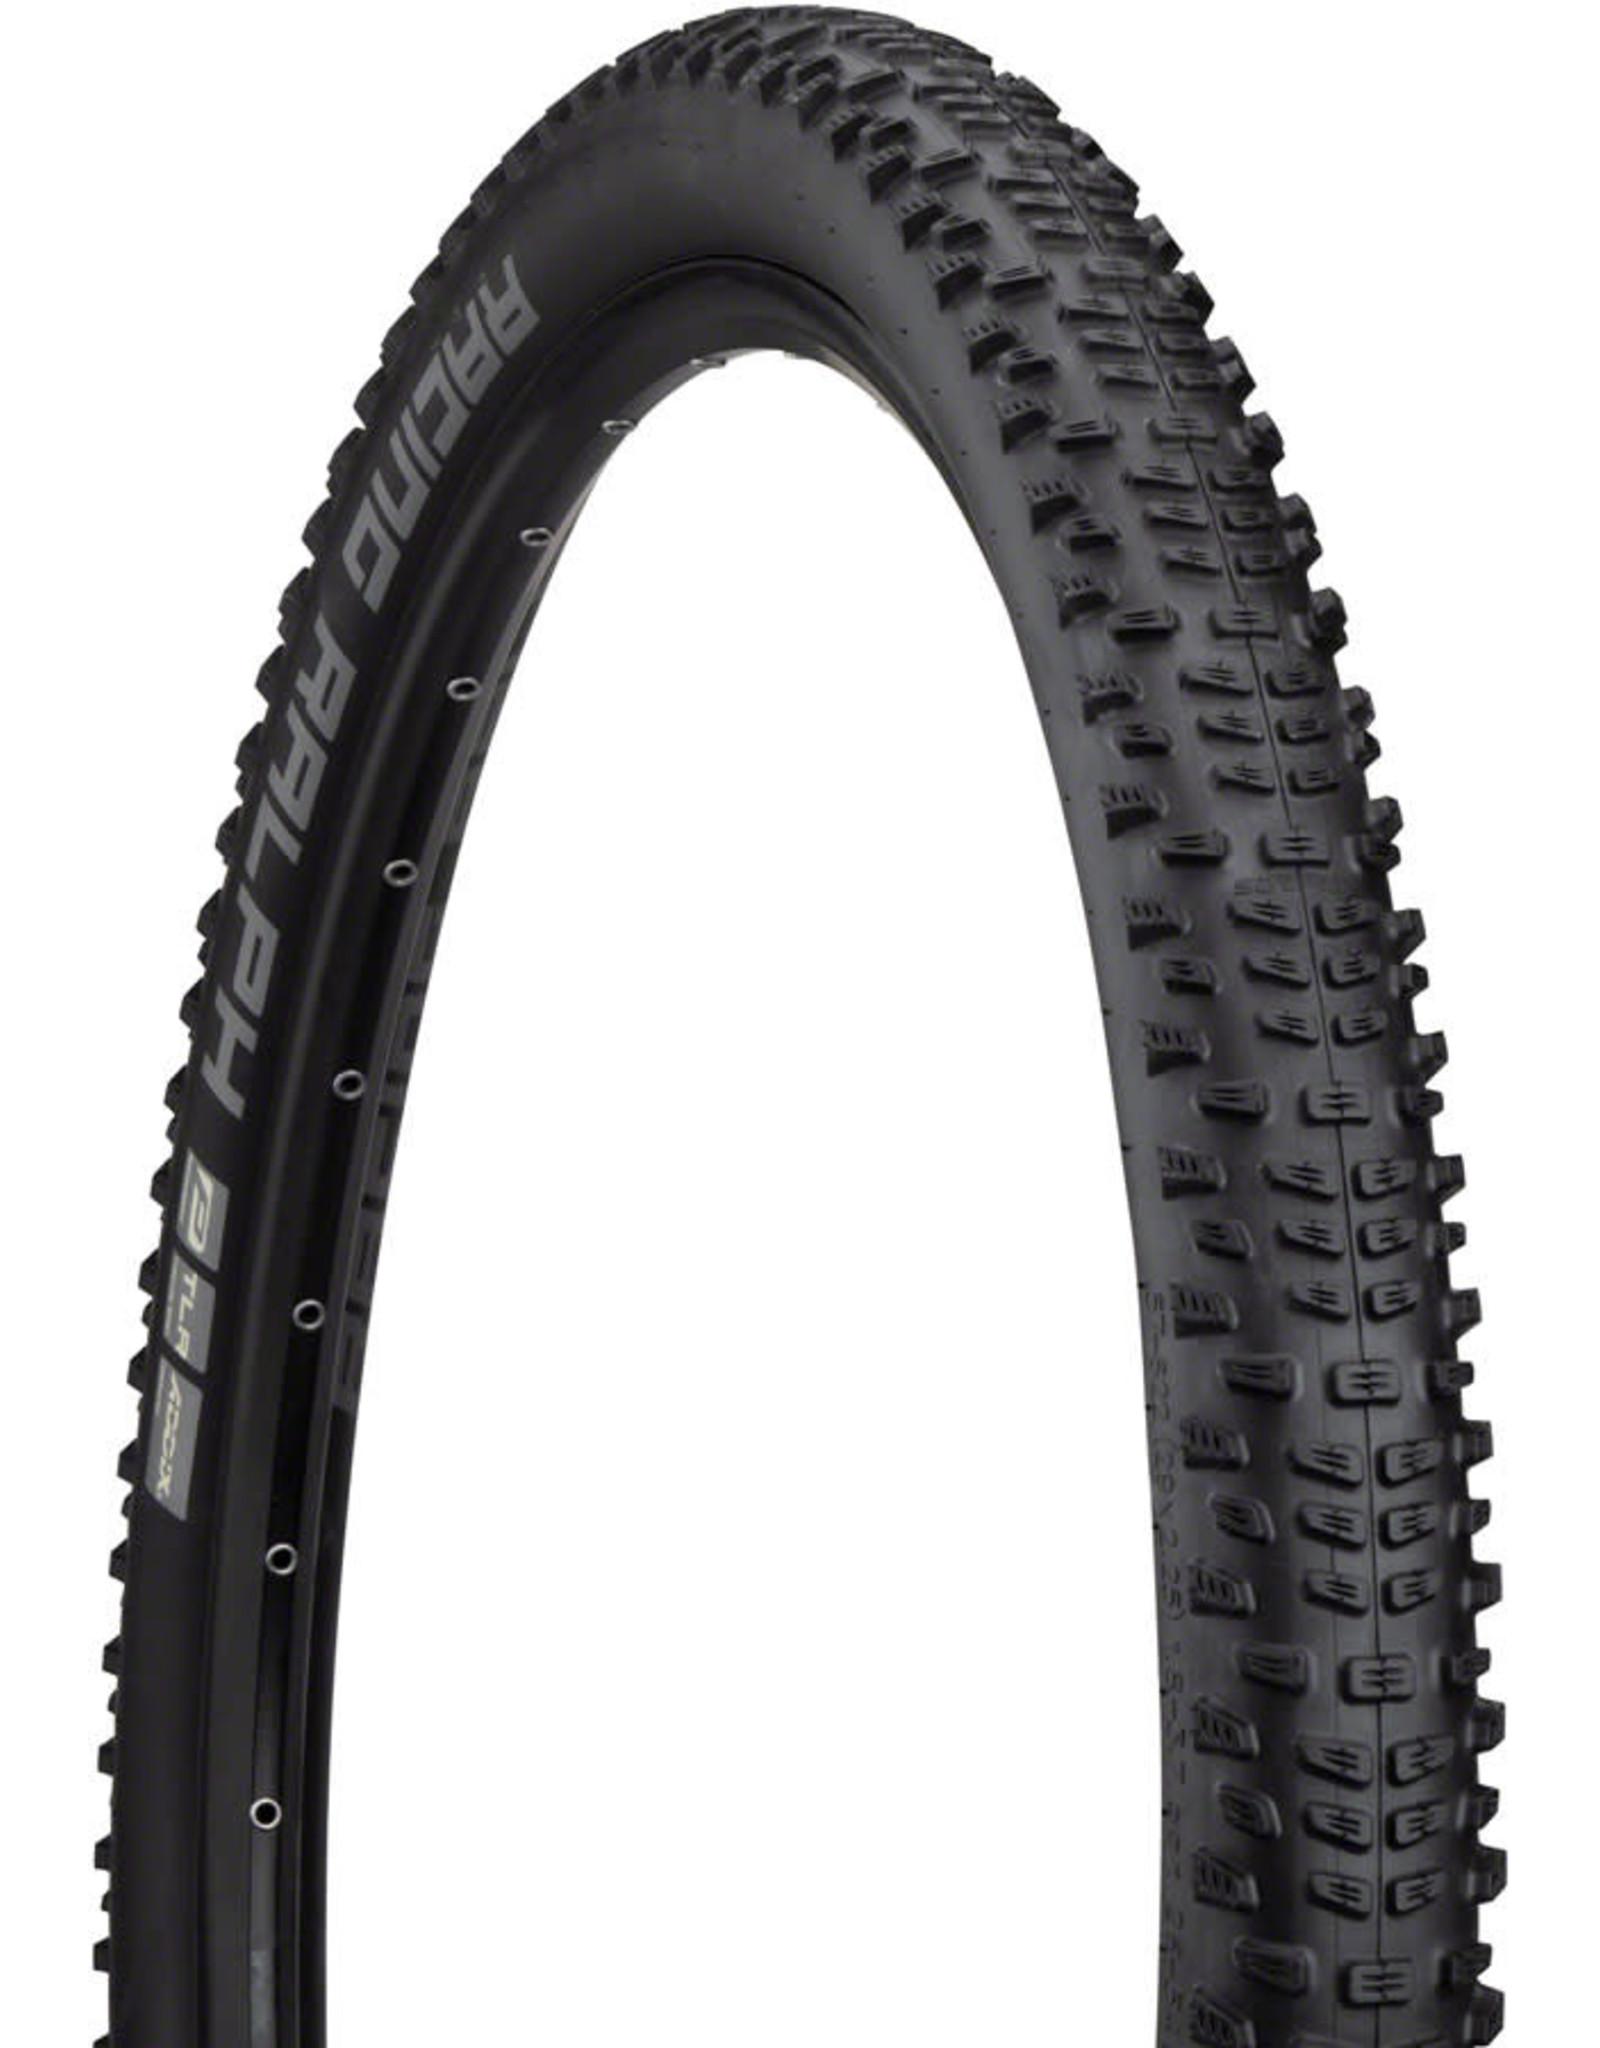 Schwalbe Schwalbe Racing Ralph Tire - 29 x 2.35, Tubeless, Folding, Black, Evolution, Super Ground, Addix Speed